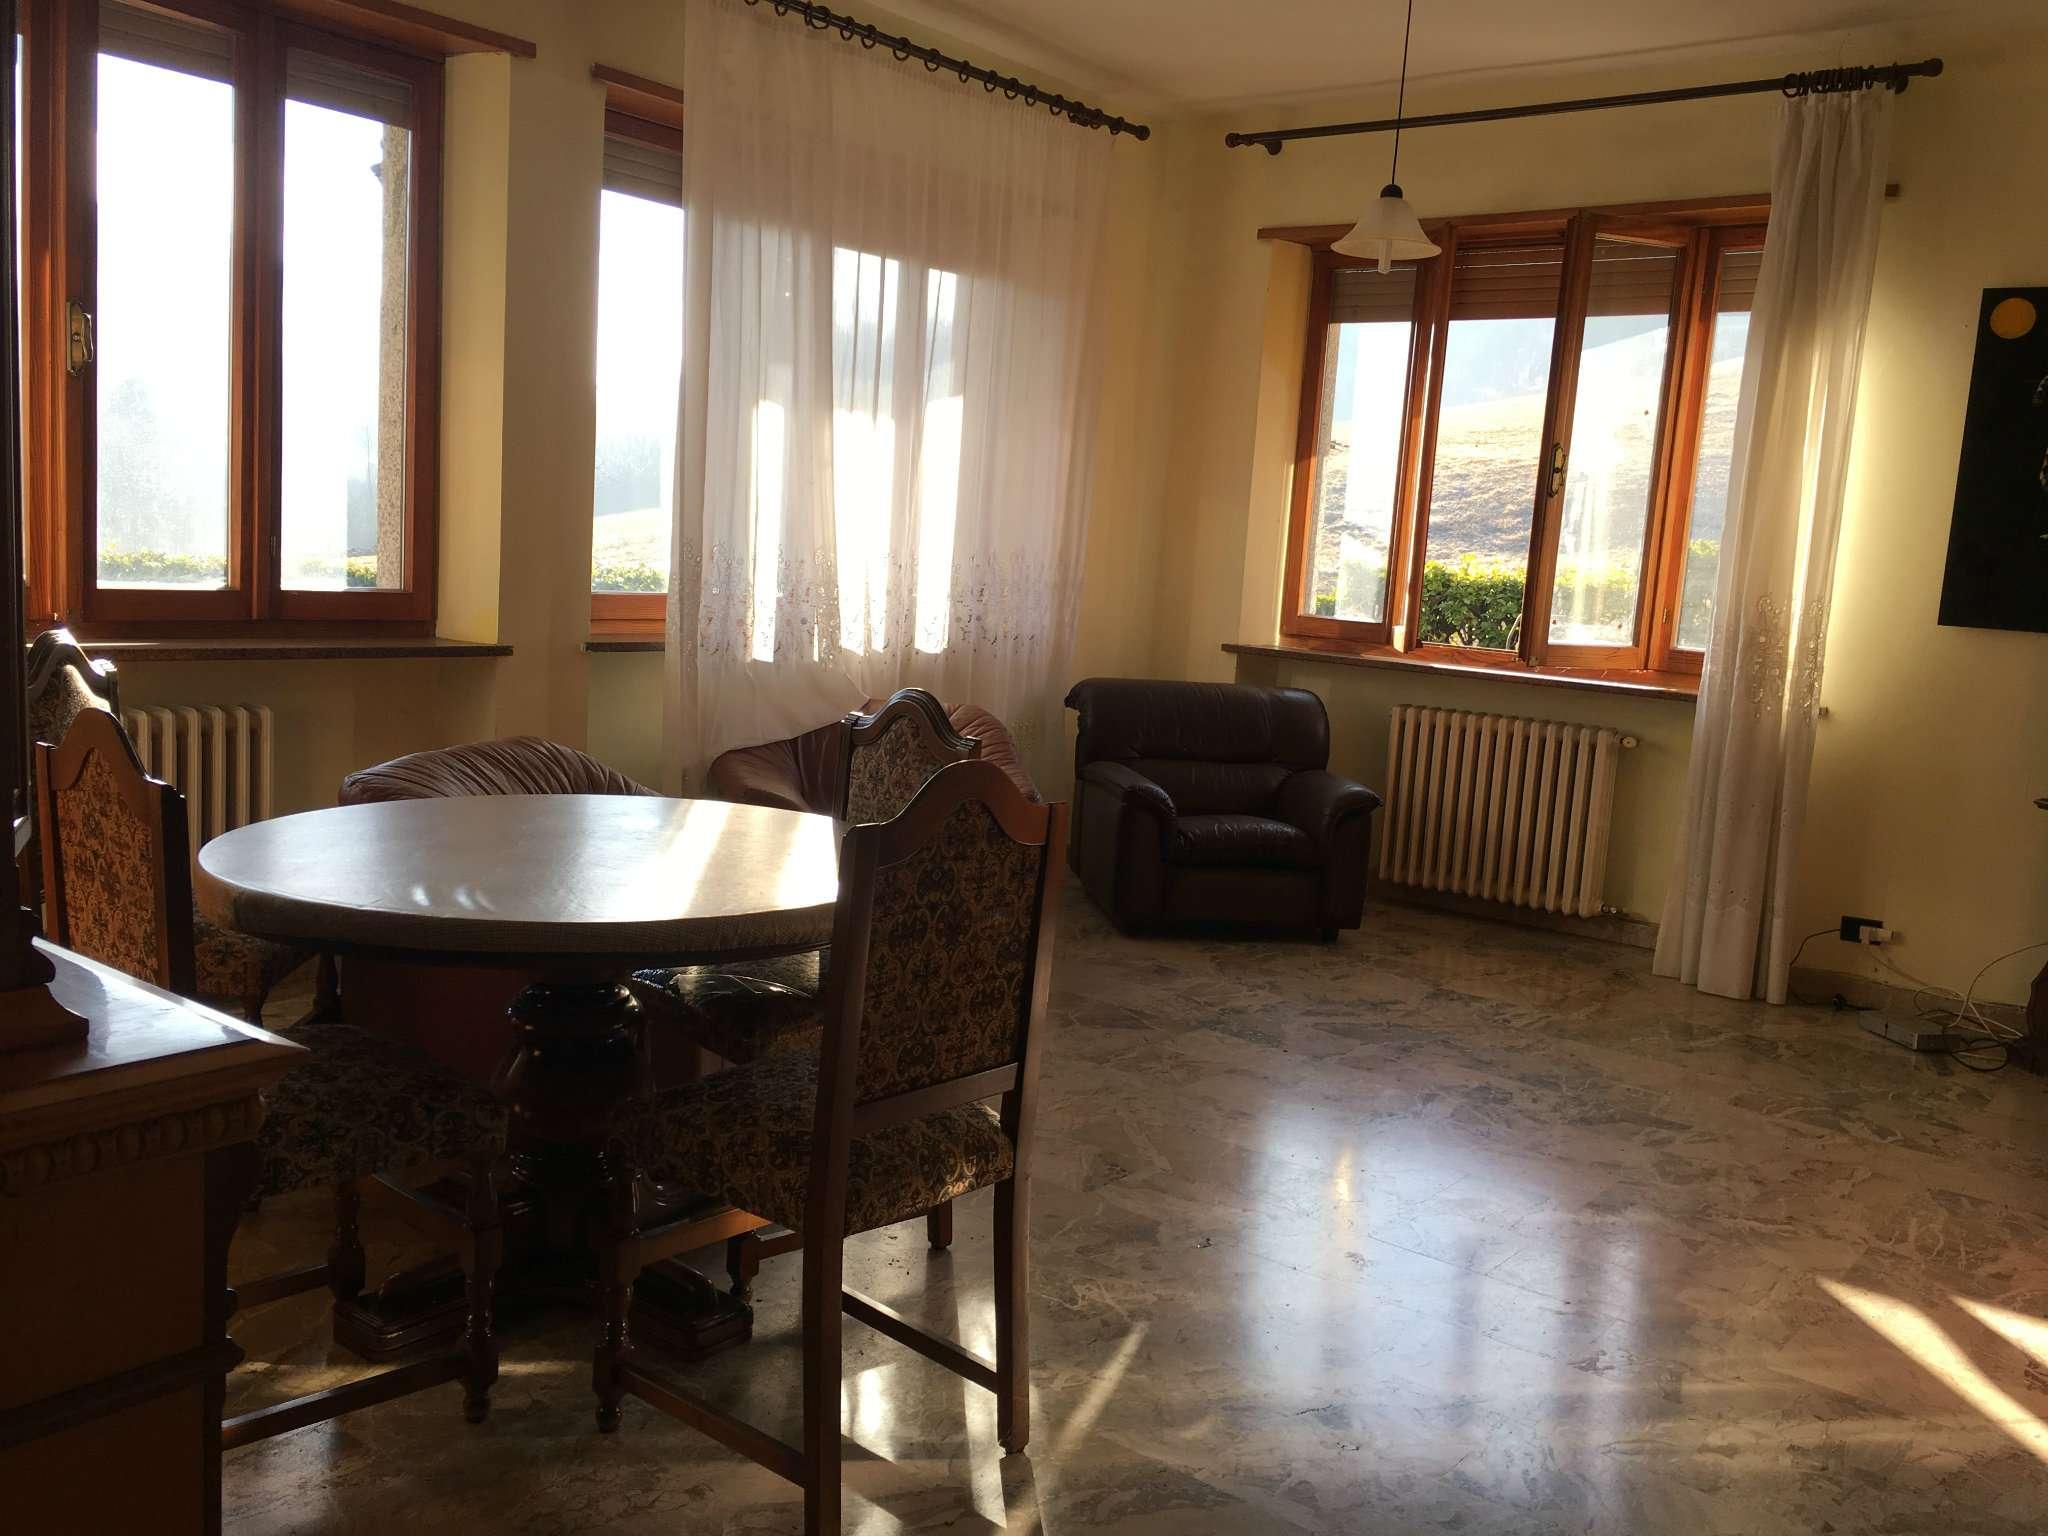 Appartamento 1 Saloncino